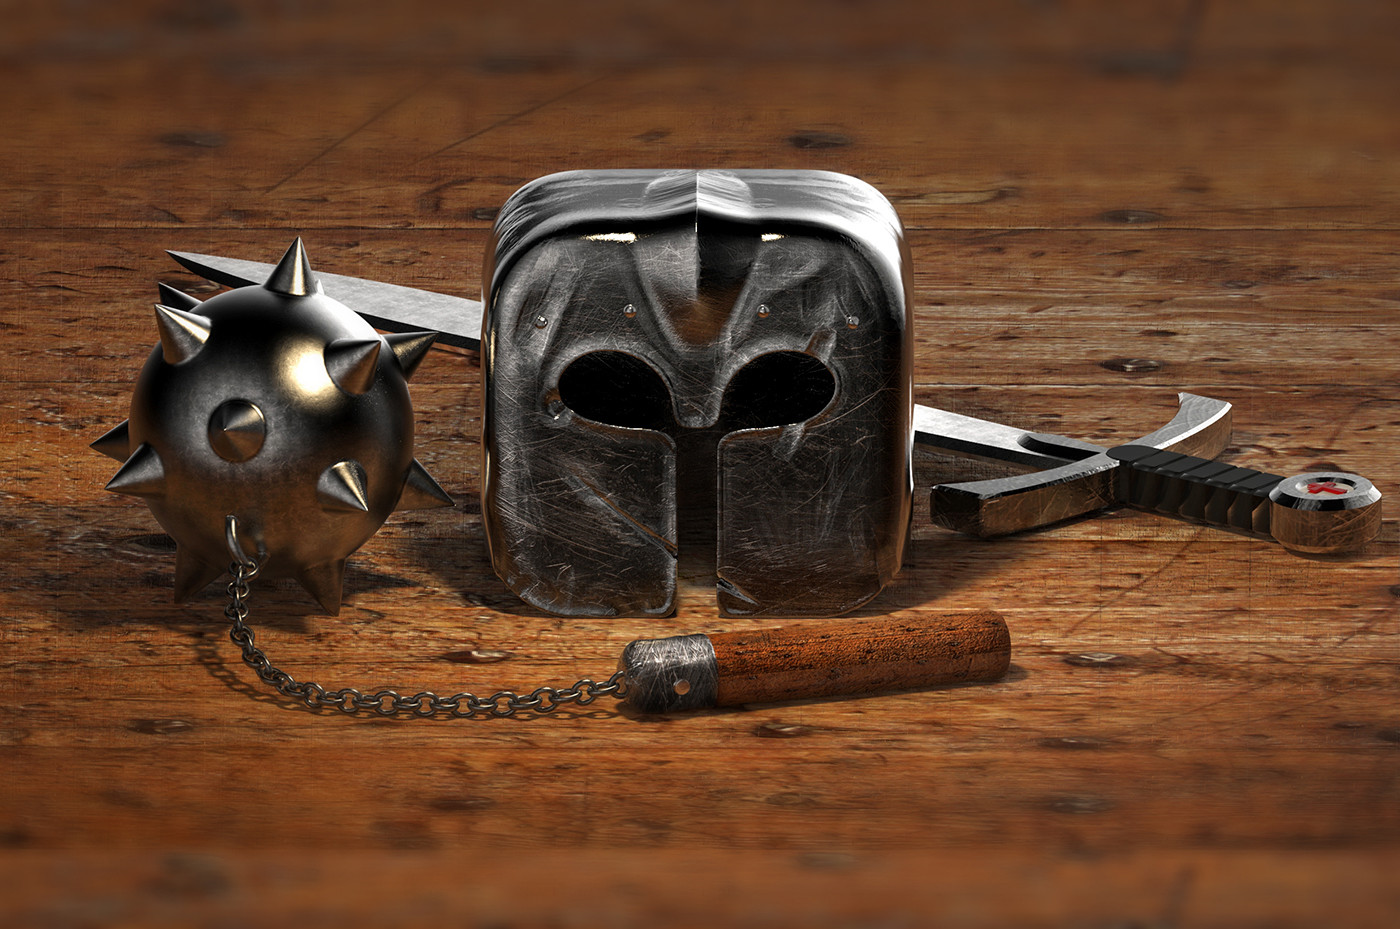 Tomislav zvonaric knight helmet scene